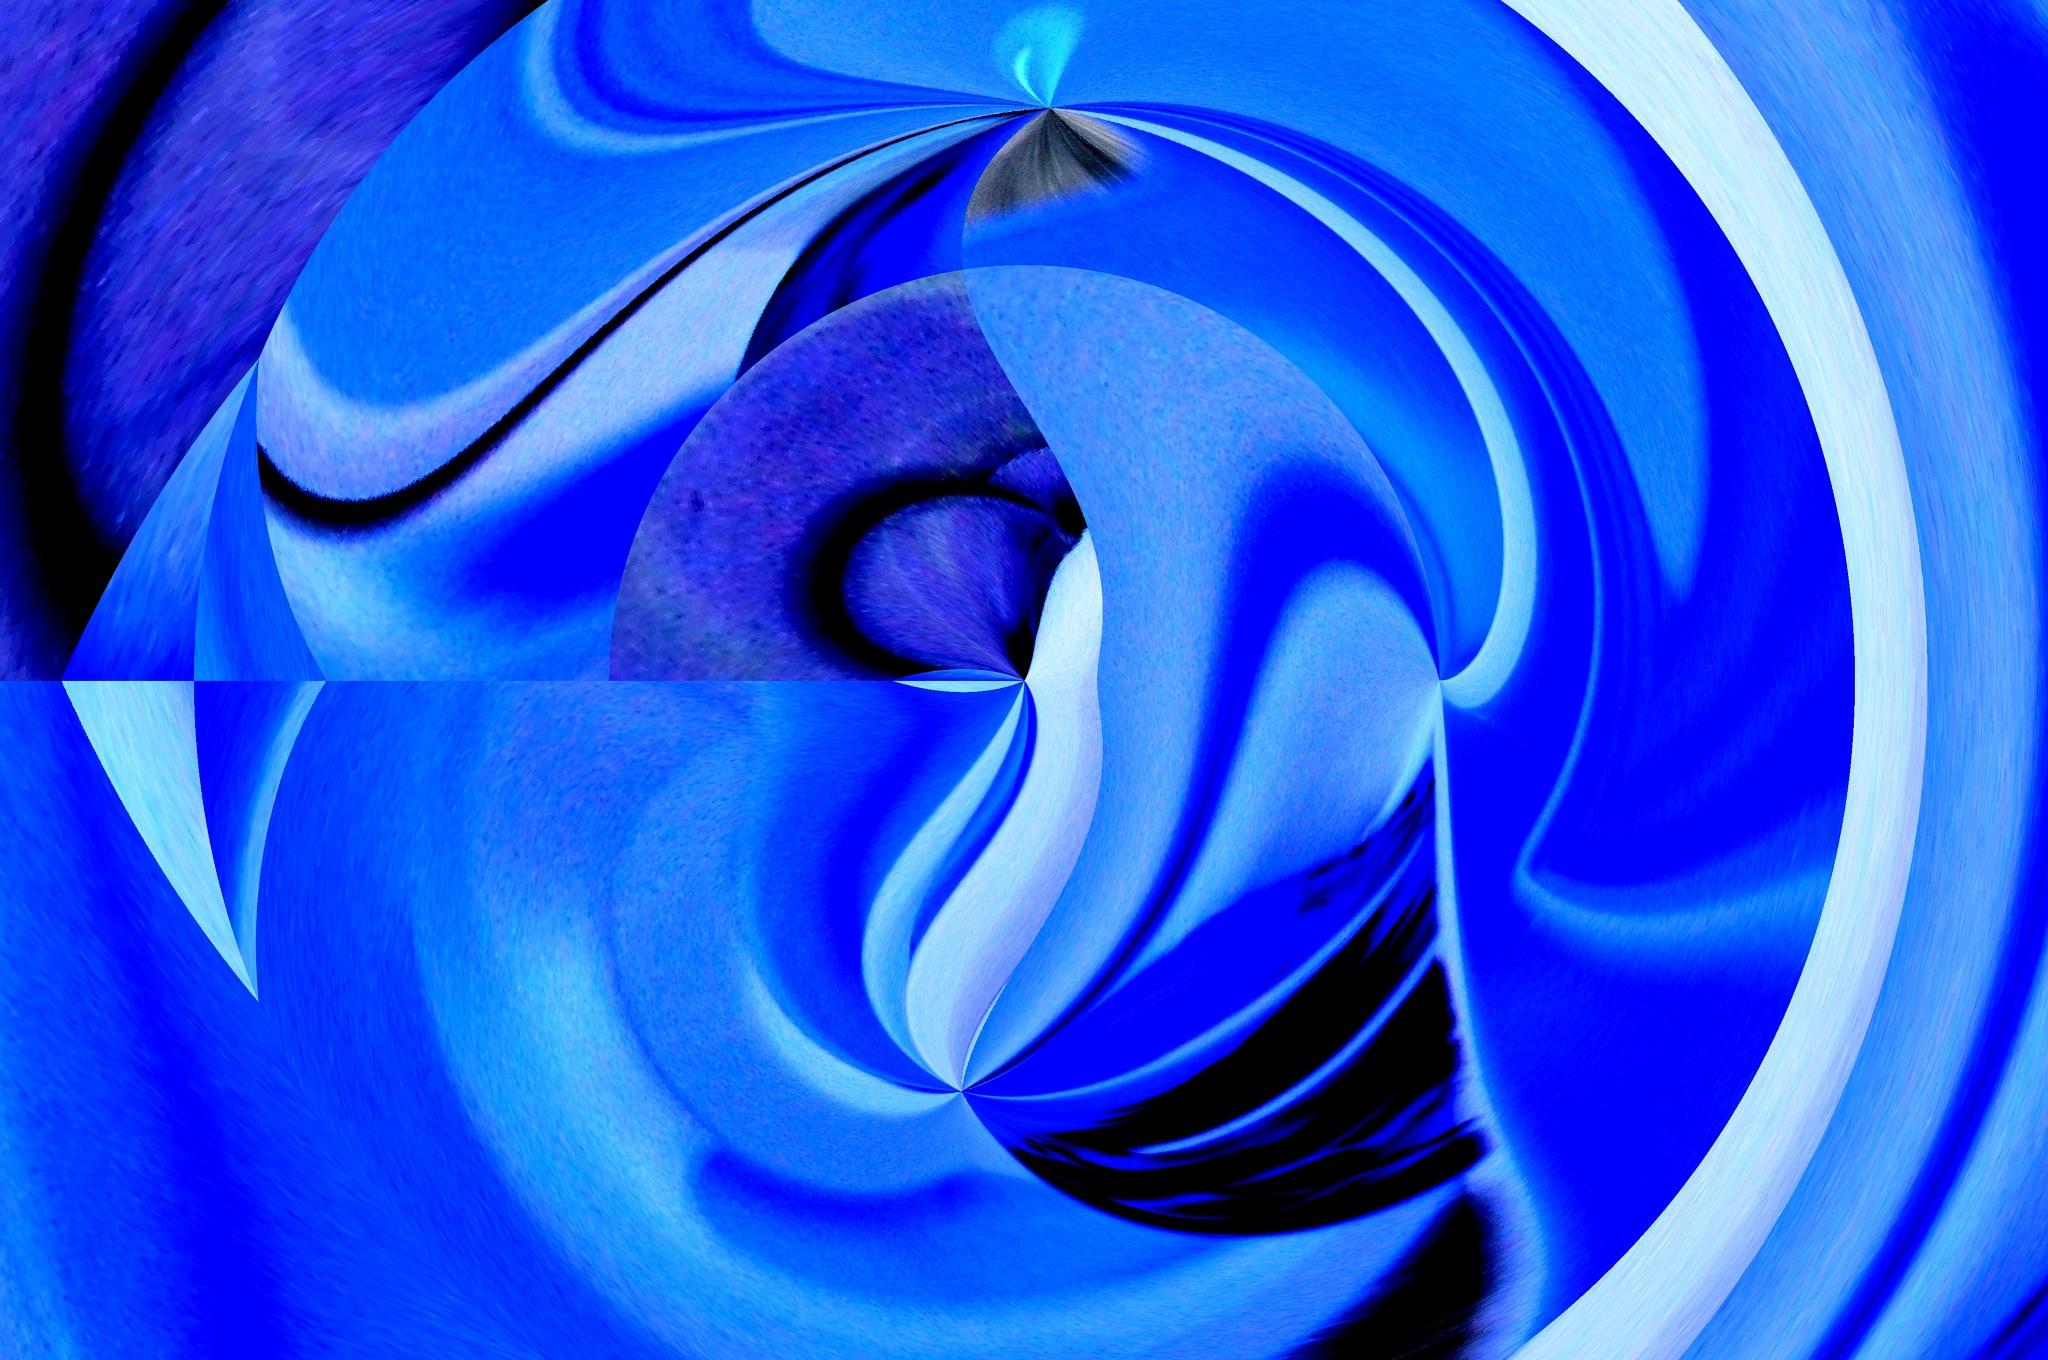 in blue by José Evaldo Suassuna de Oliveira